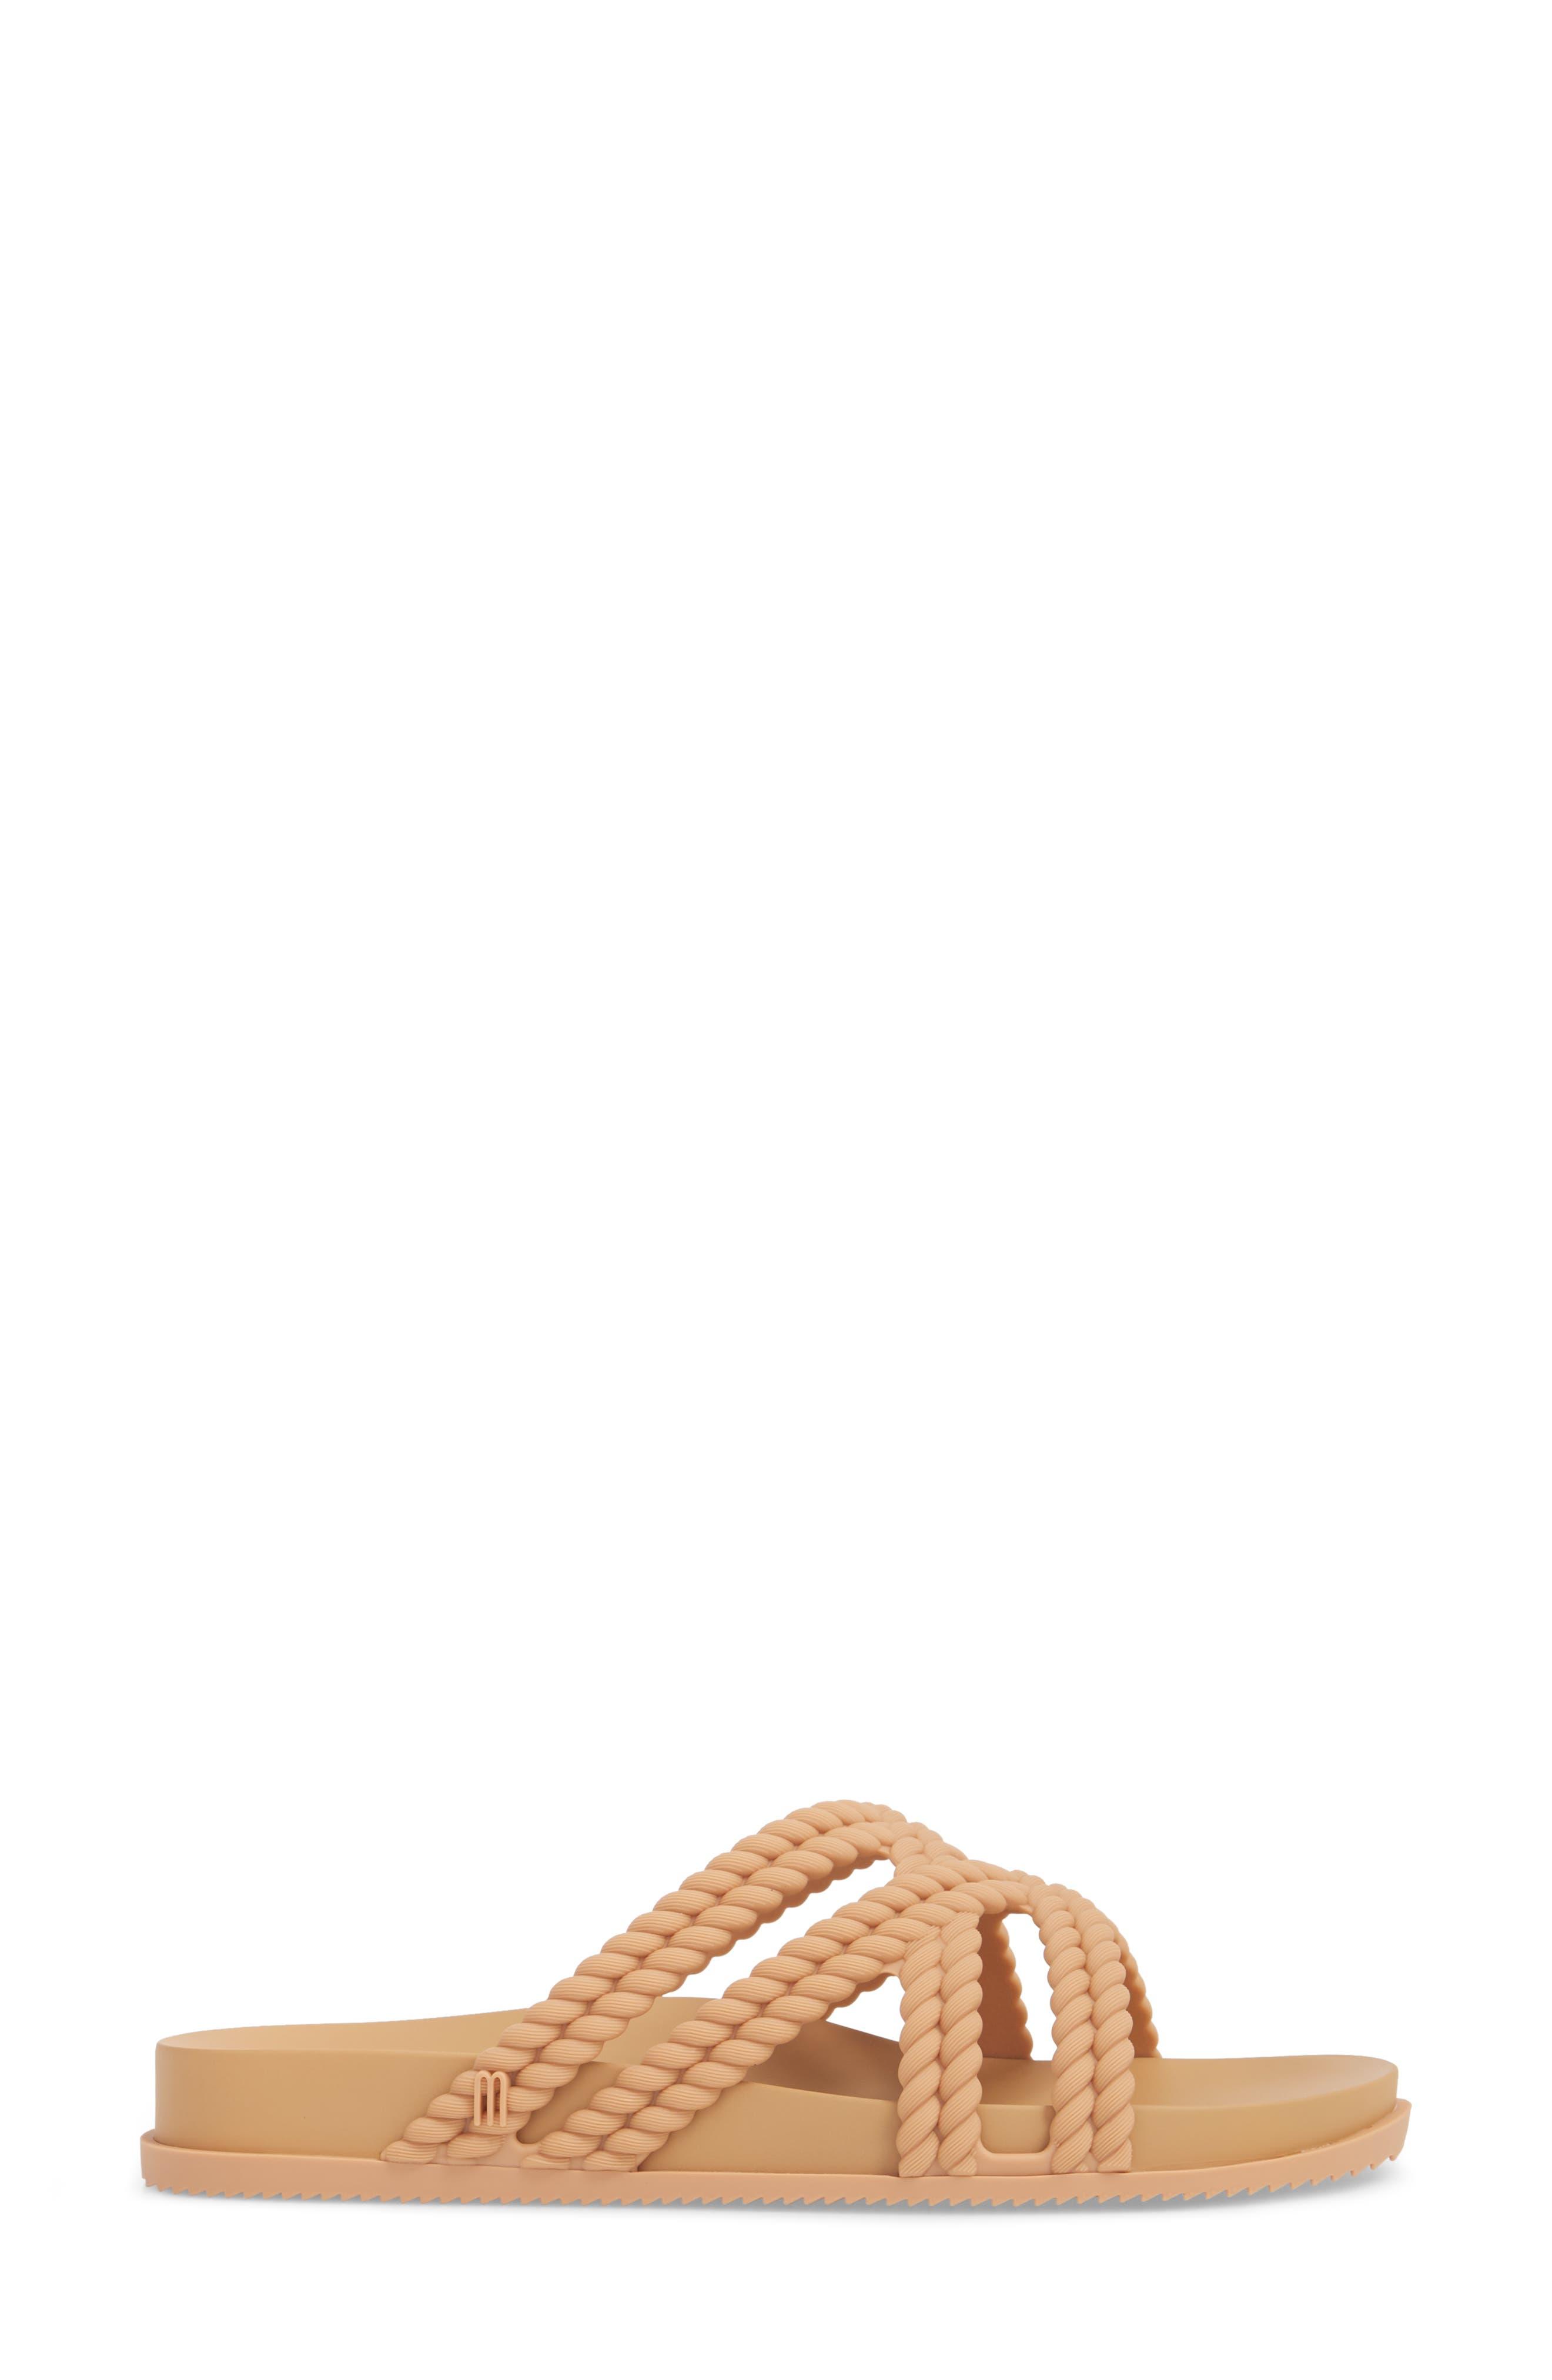 Cosmic Salinas Slide Sandal,                             Alternate thumbnail 3, color,                             Light Brown